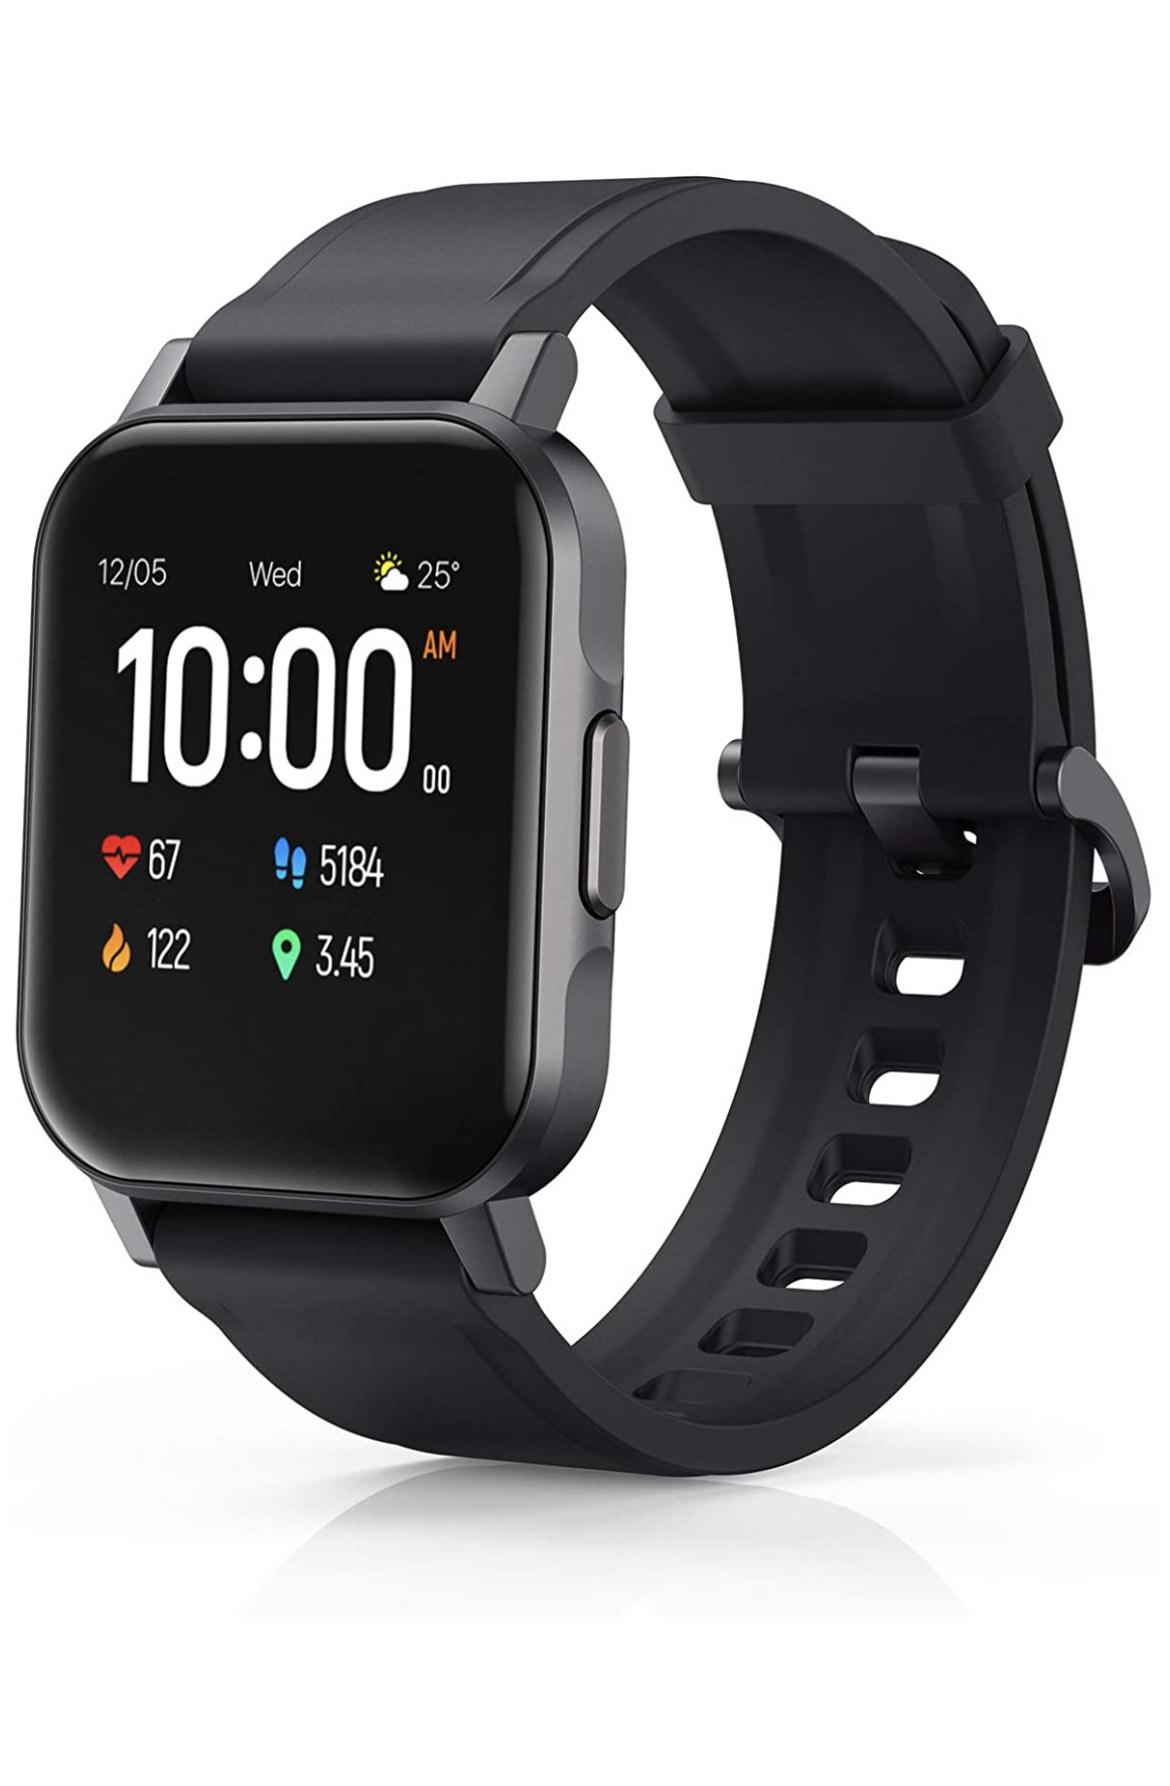 AUKEY Smartwatch / Fitnesstracker / Herzfrequenzsensor / 20 Tage Standby